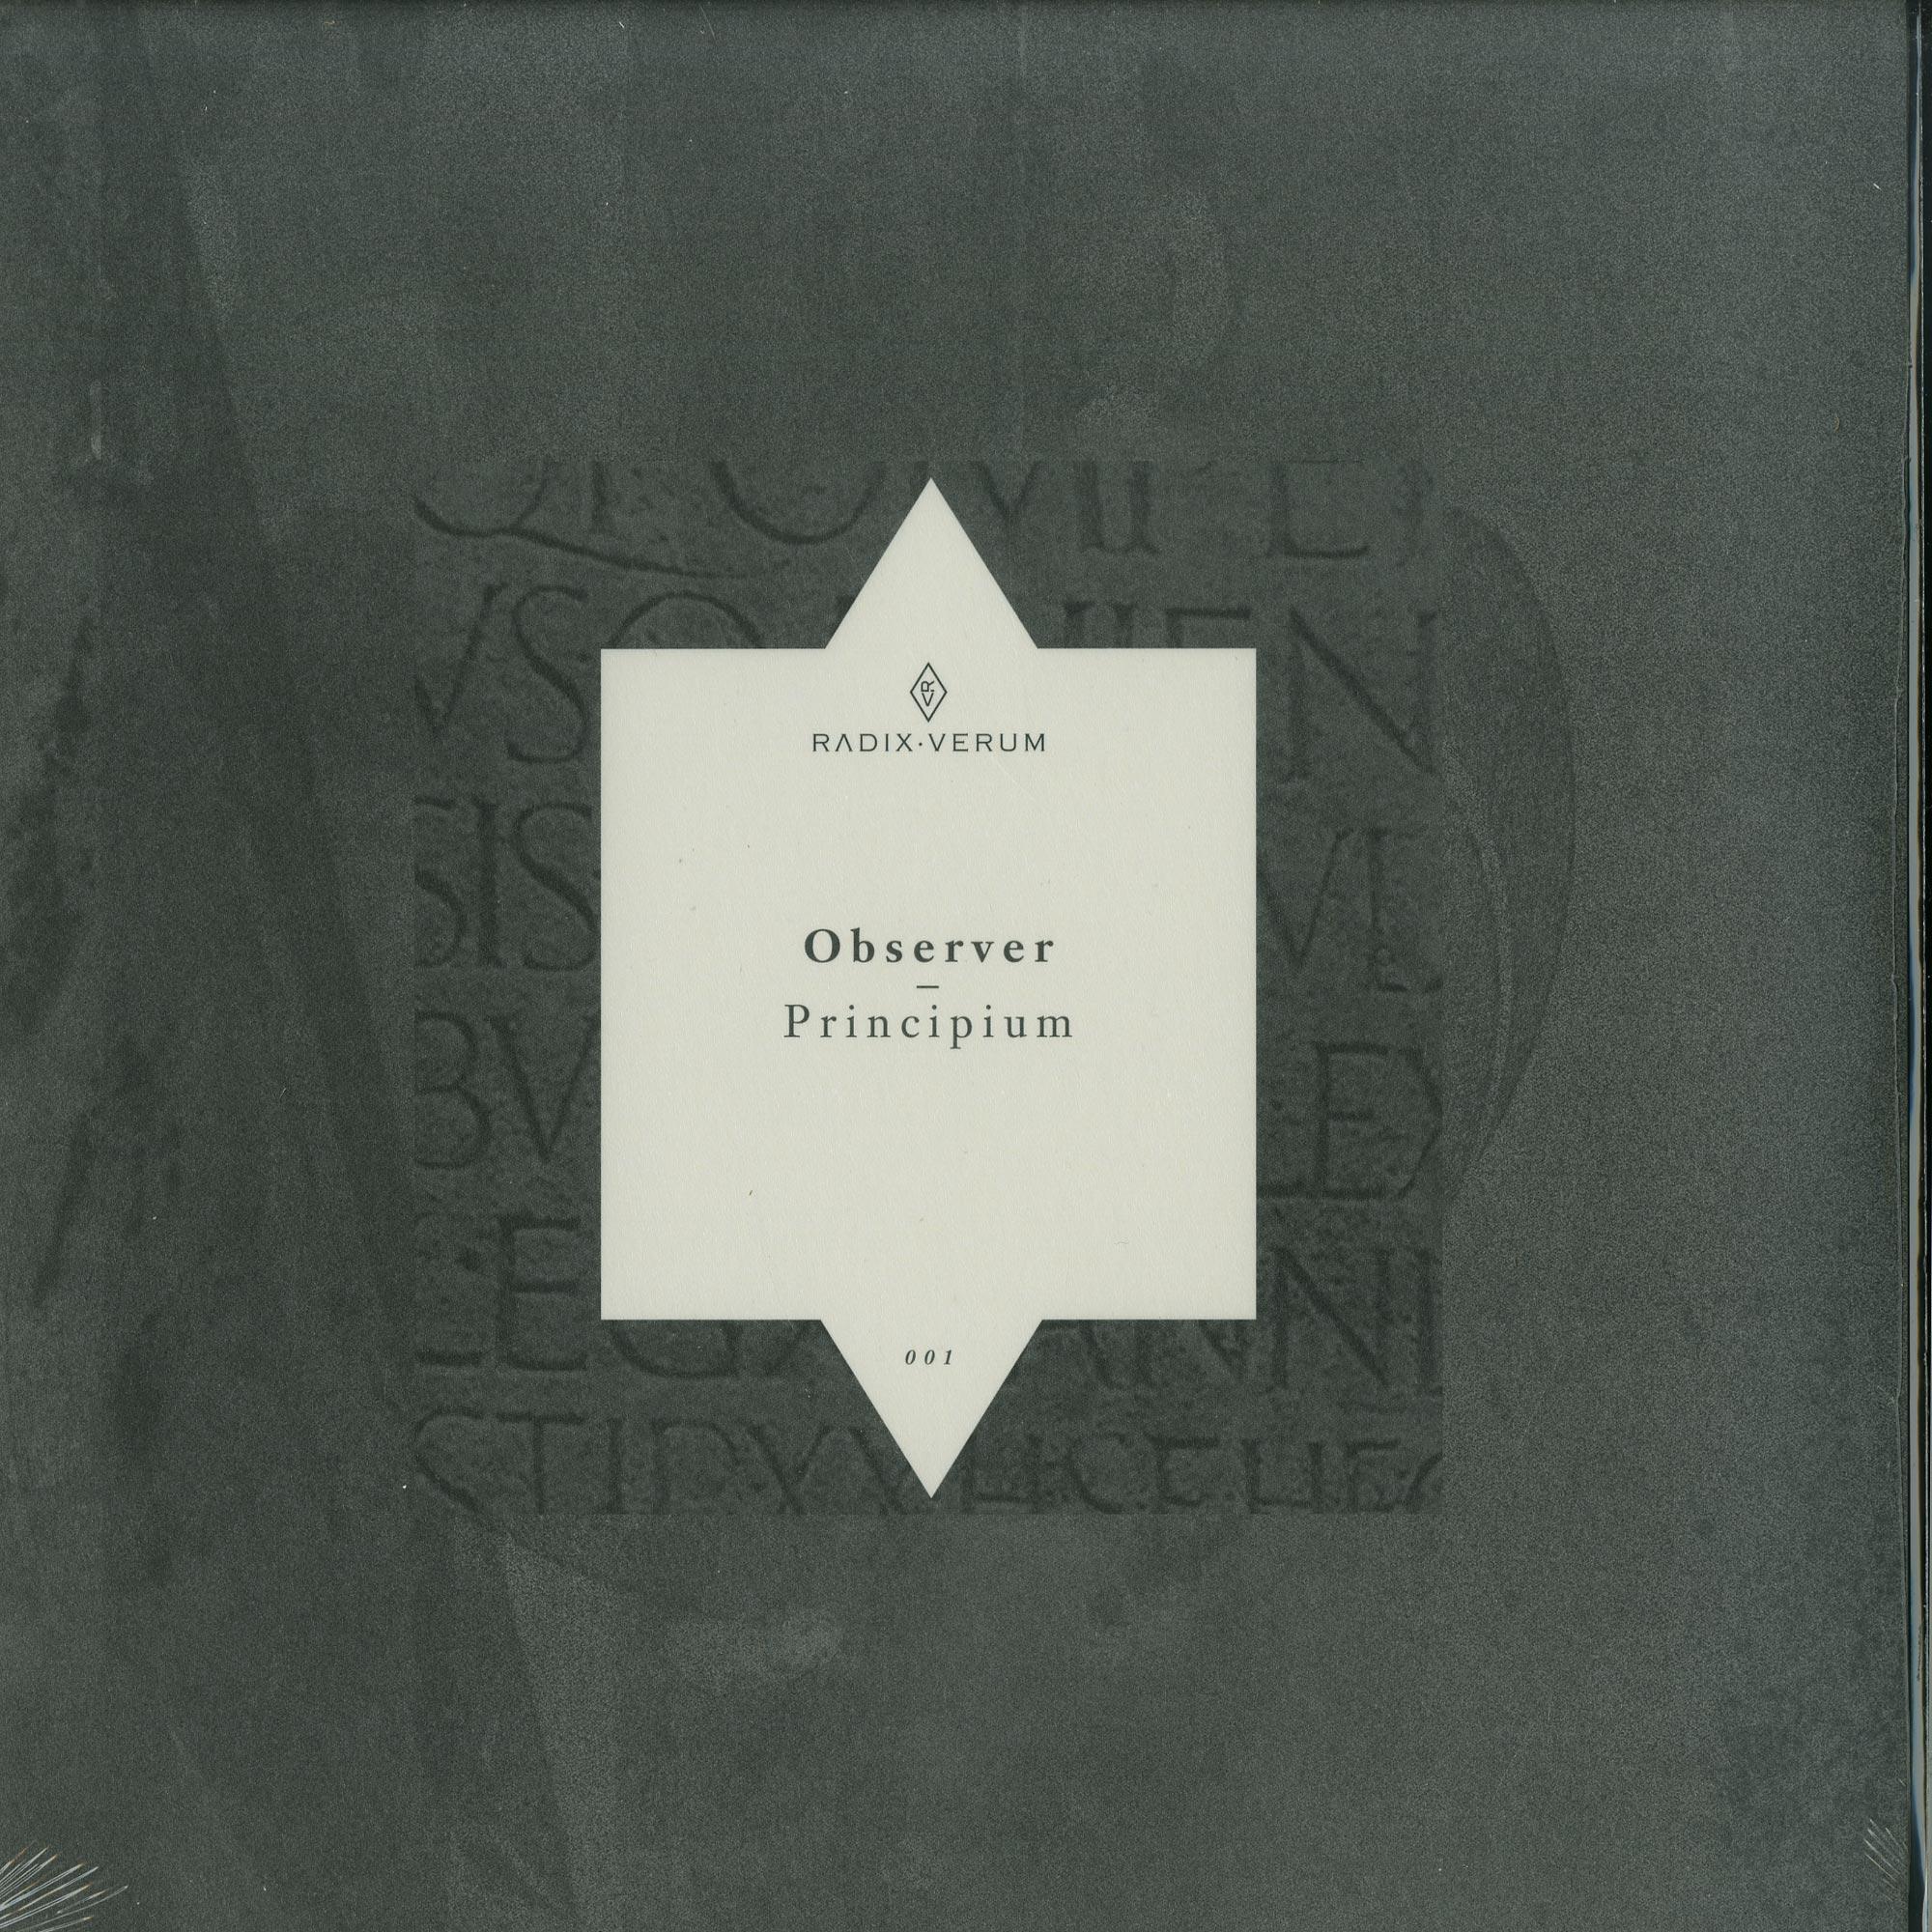 Observer - PRINCIPIUM EP